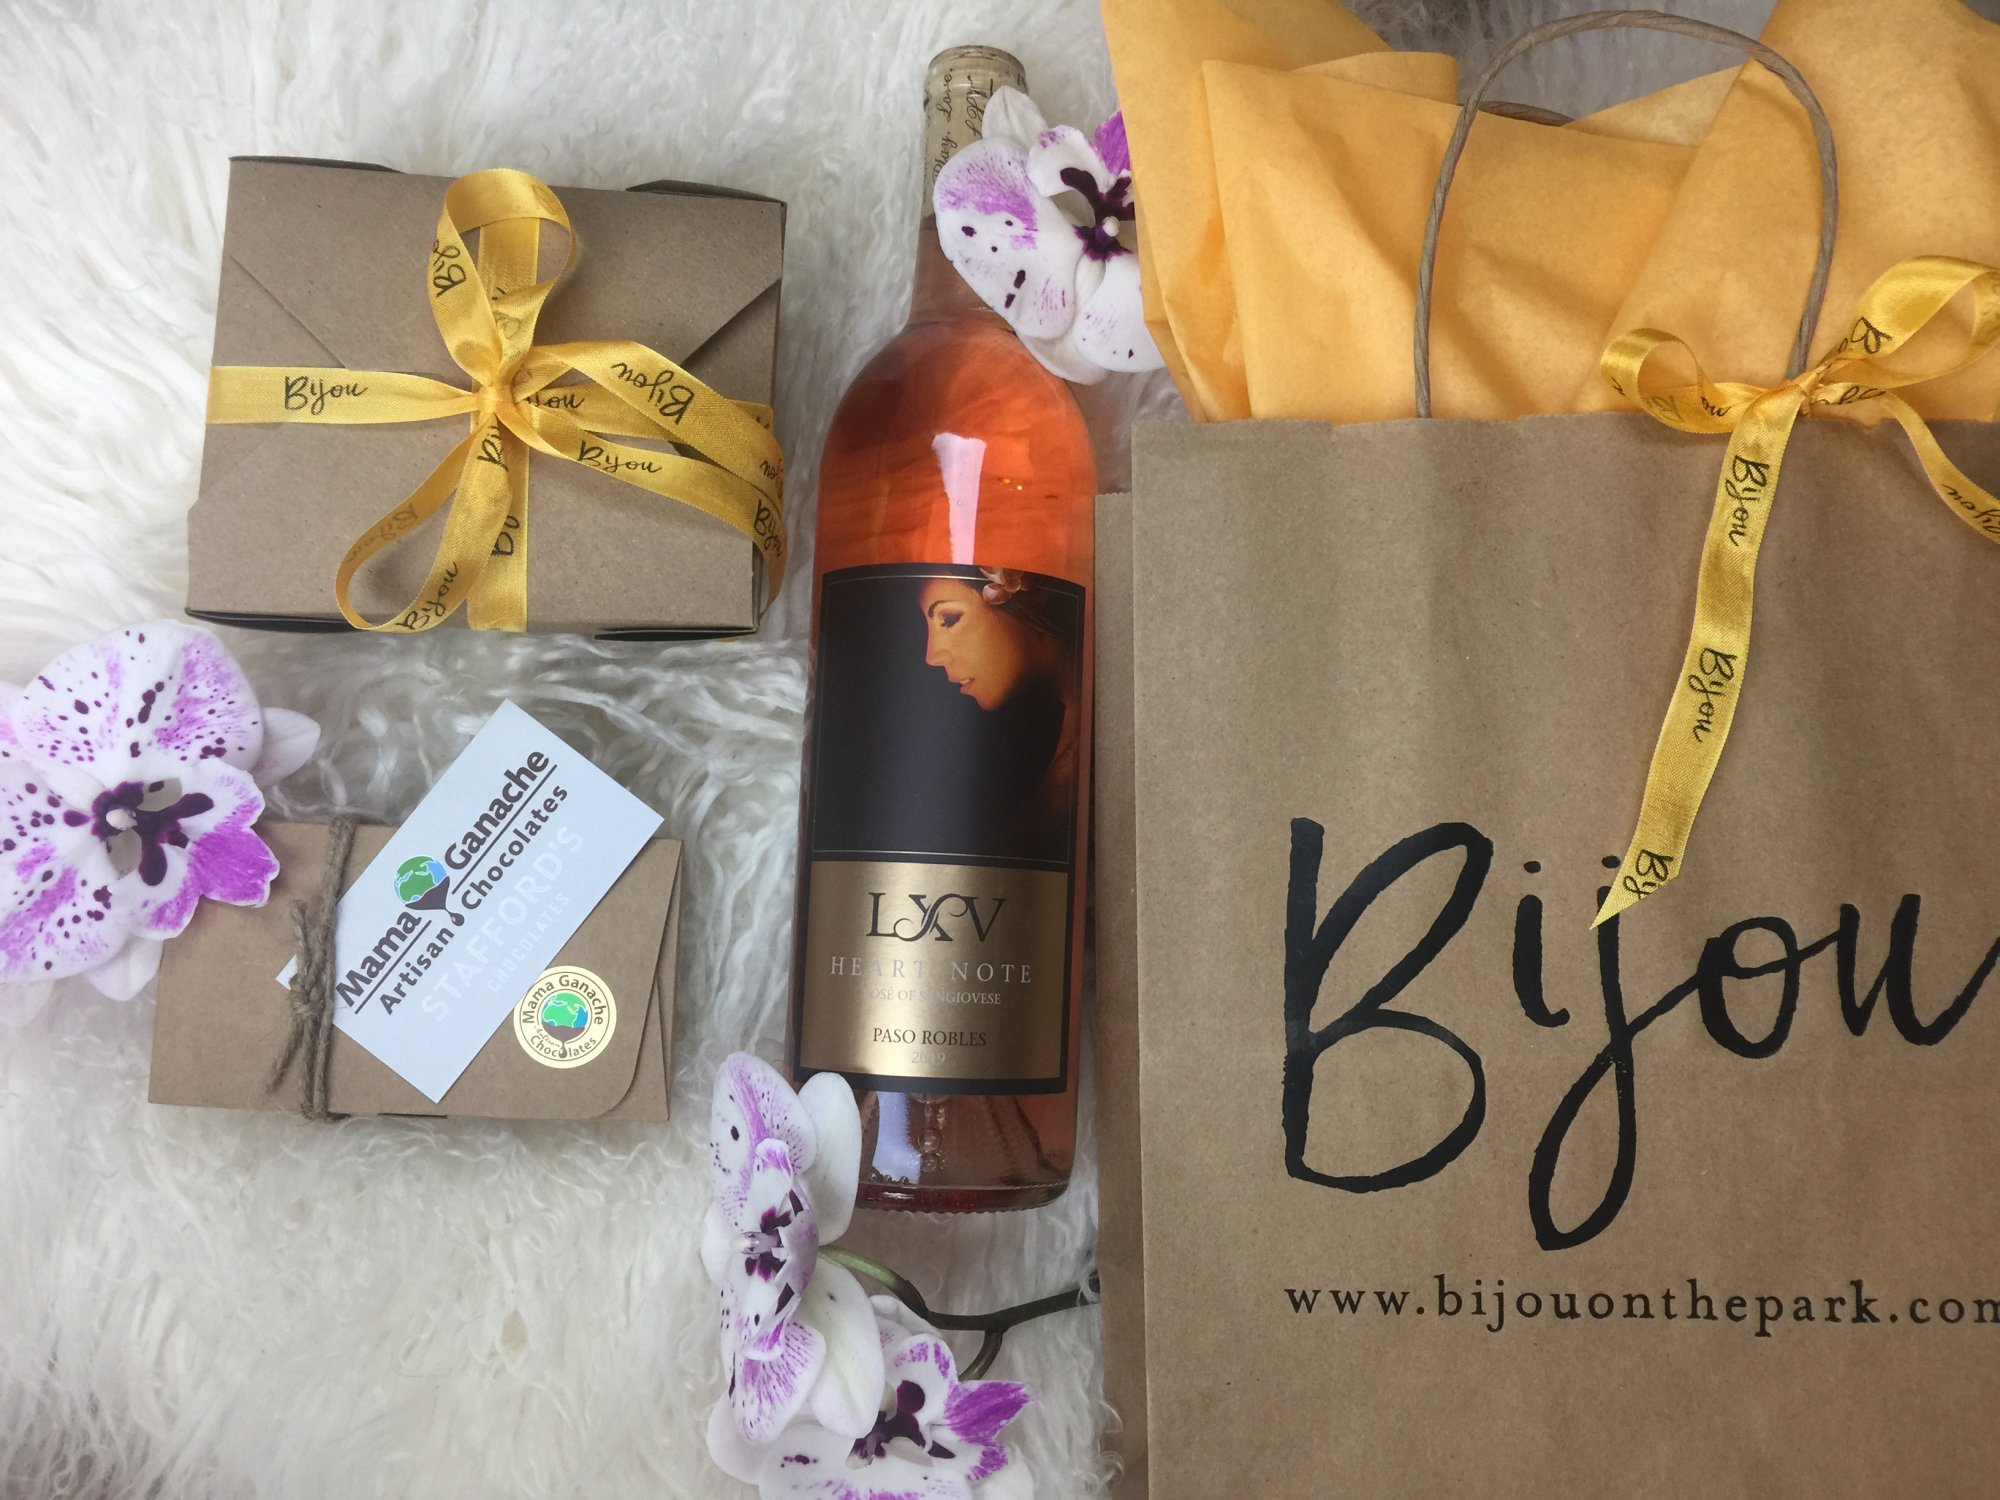 LXV Rose Gift Set & $150 Gift Card